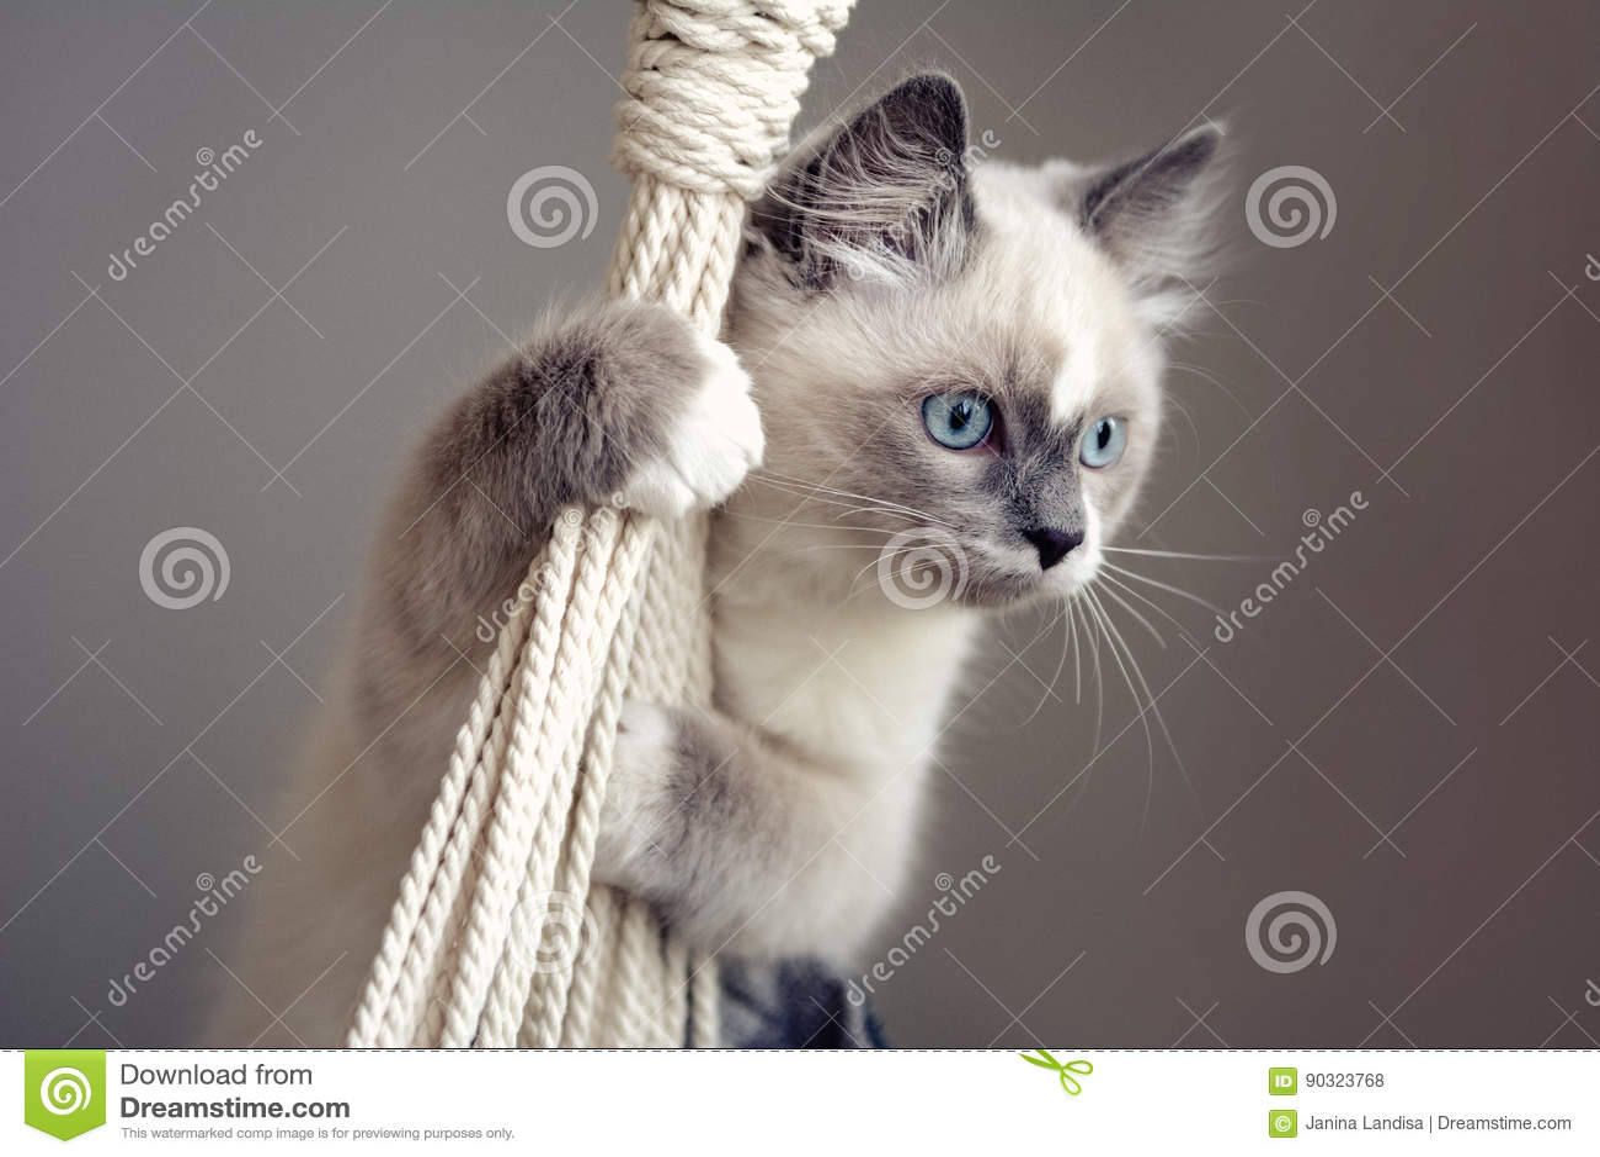 Ragdoll cat climbing a rope